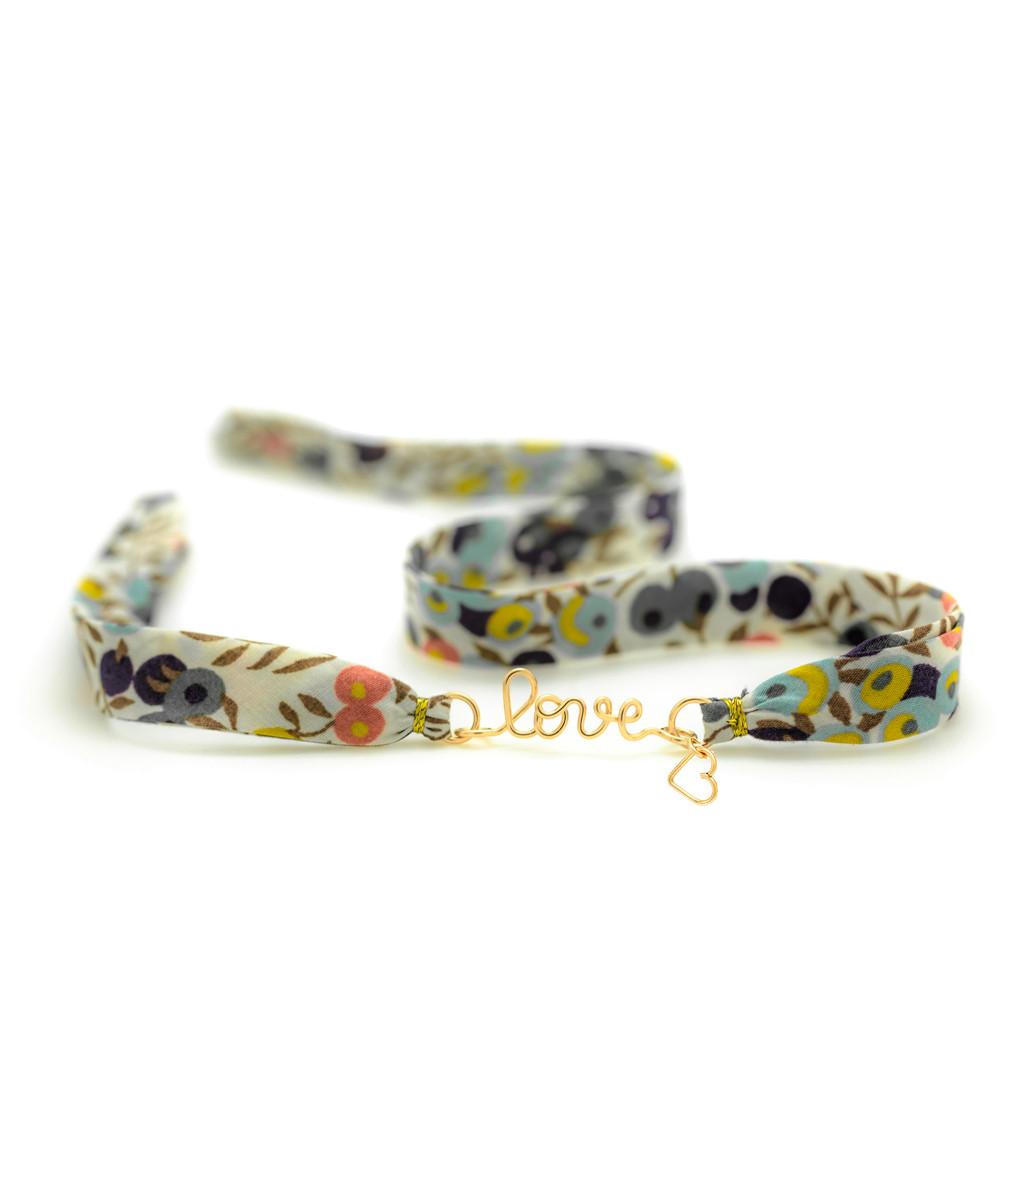 ATELIER PAULIN - Bracelet Double Liberty Love Charms Gold Filled 14K